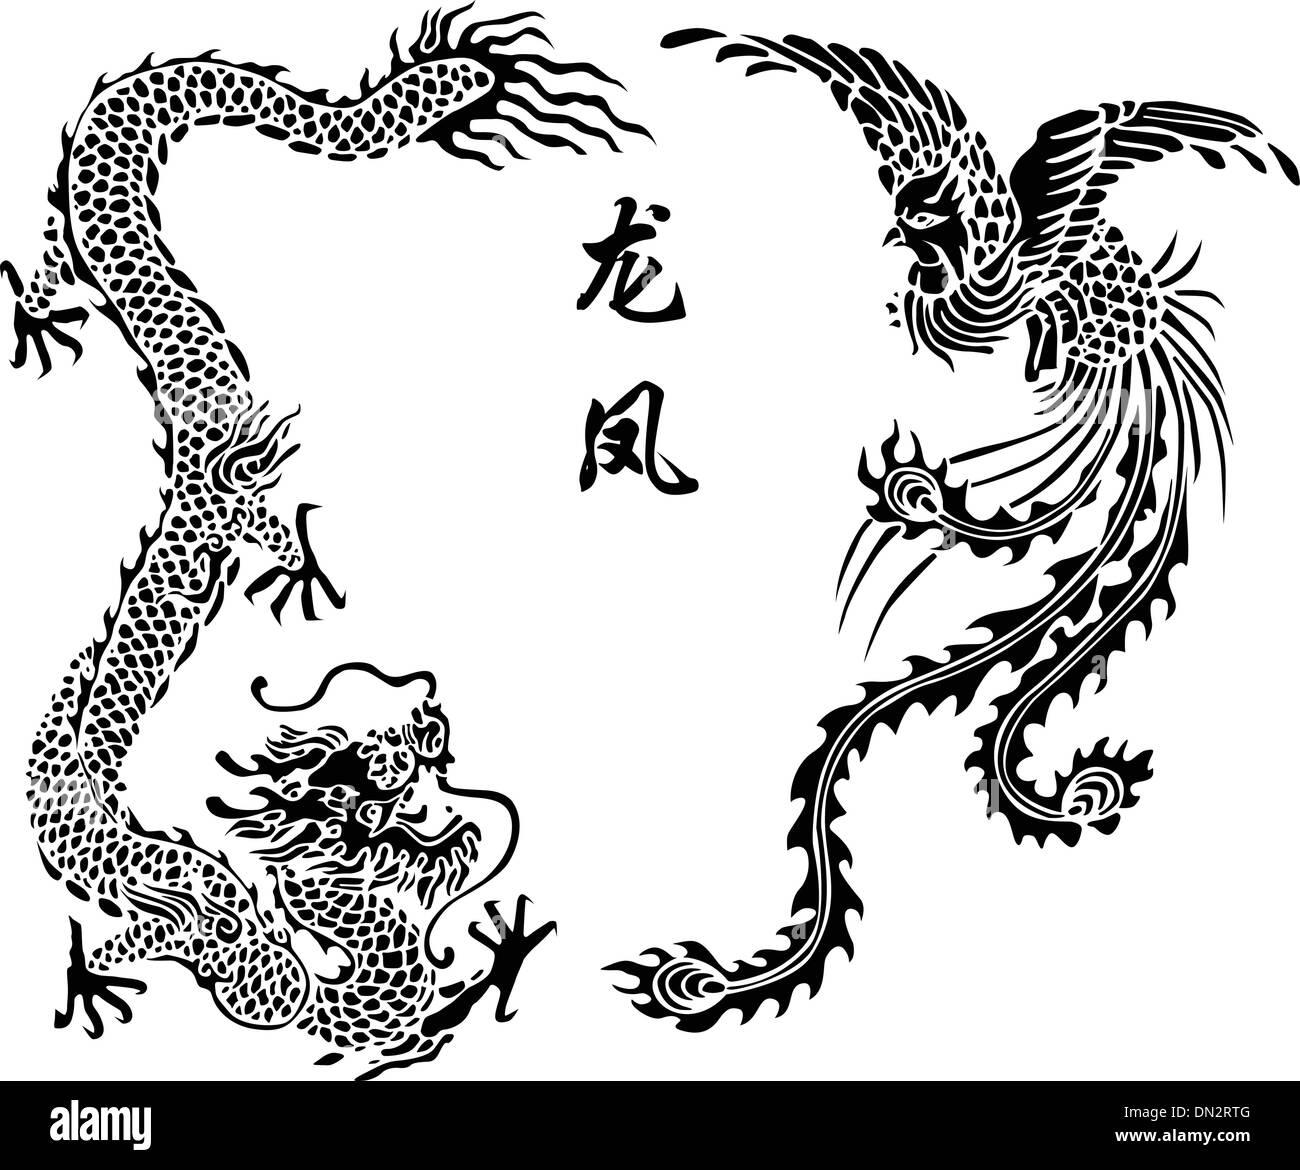 Dragon and Phoenix - Stock Image